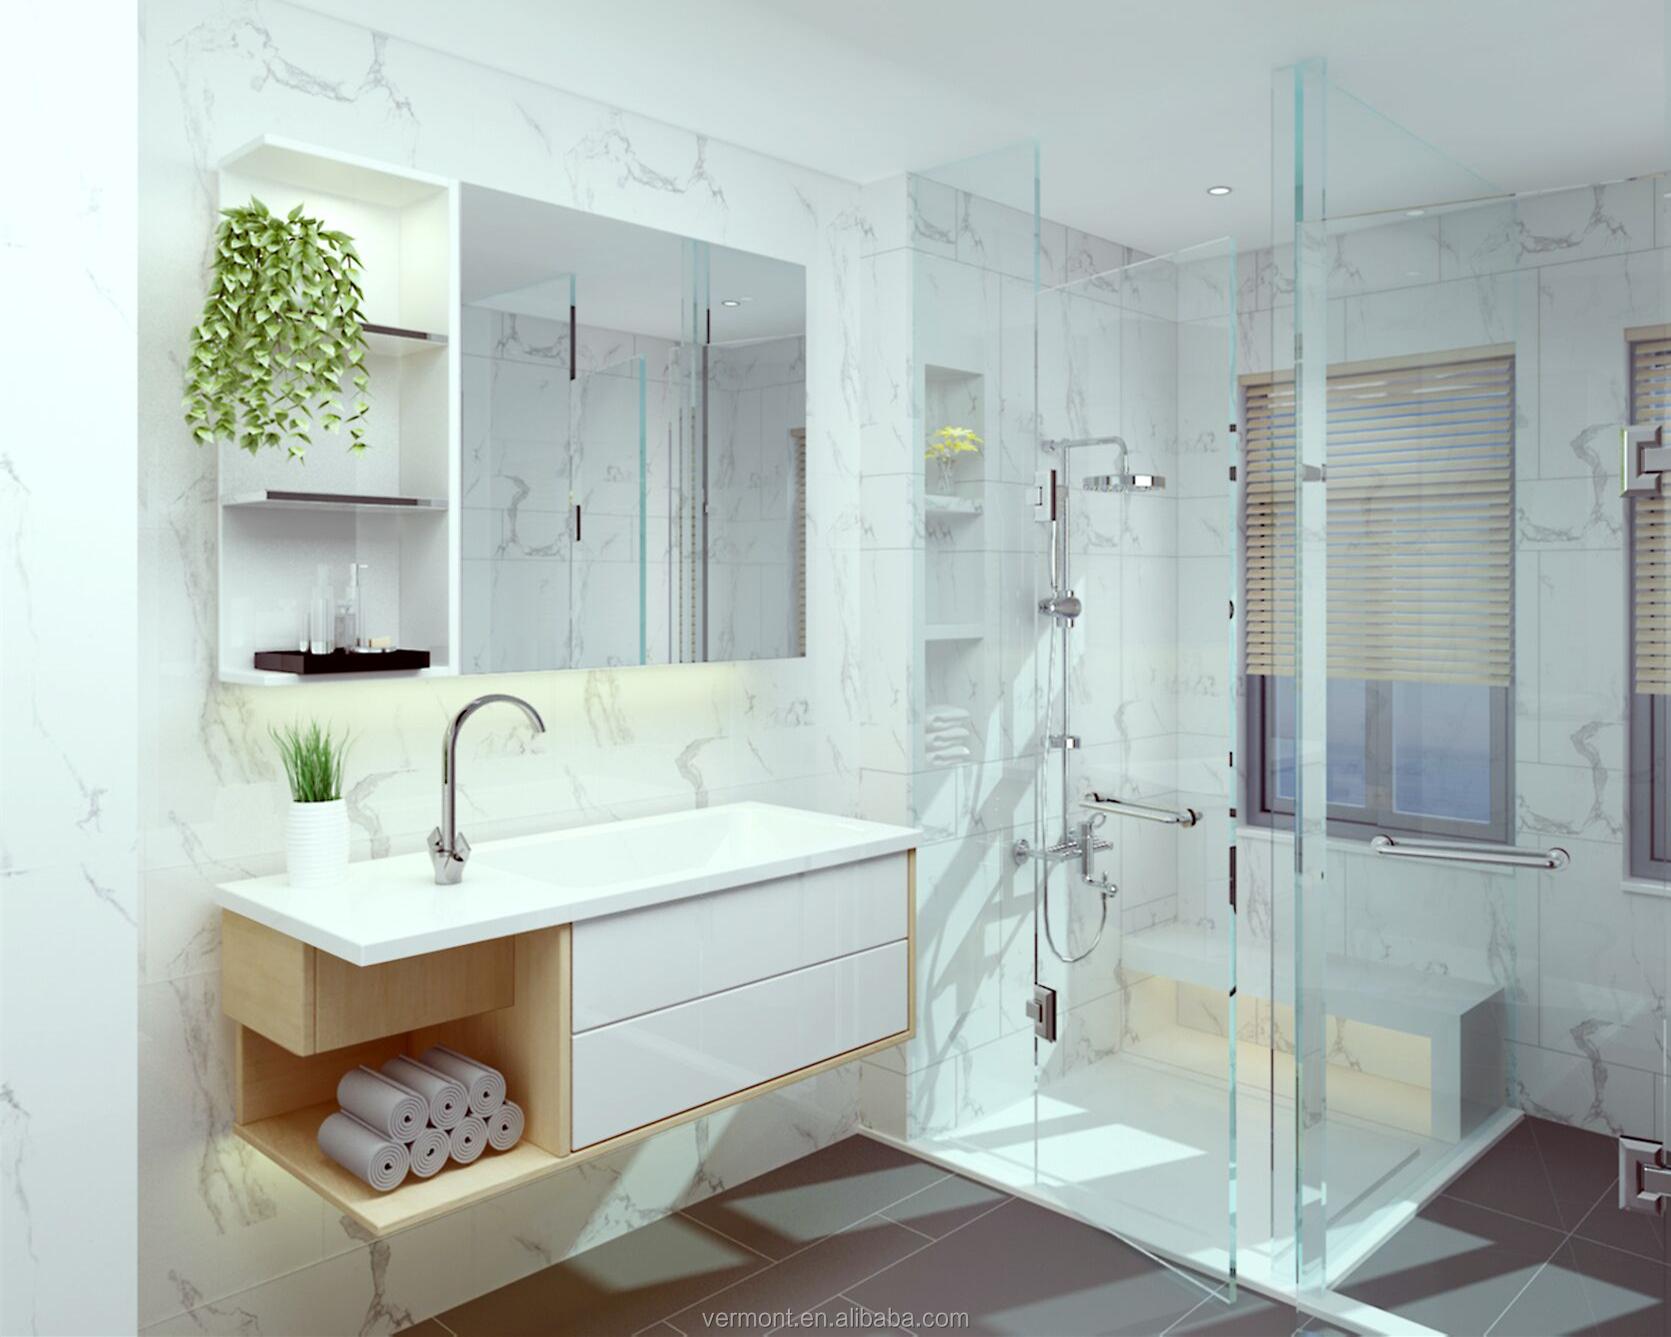 2018 Vermont Hot New Modern Bathroom Vanity Design Wall Mount, View ...